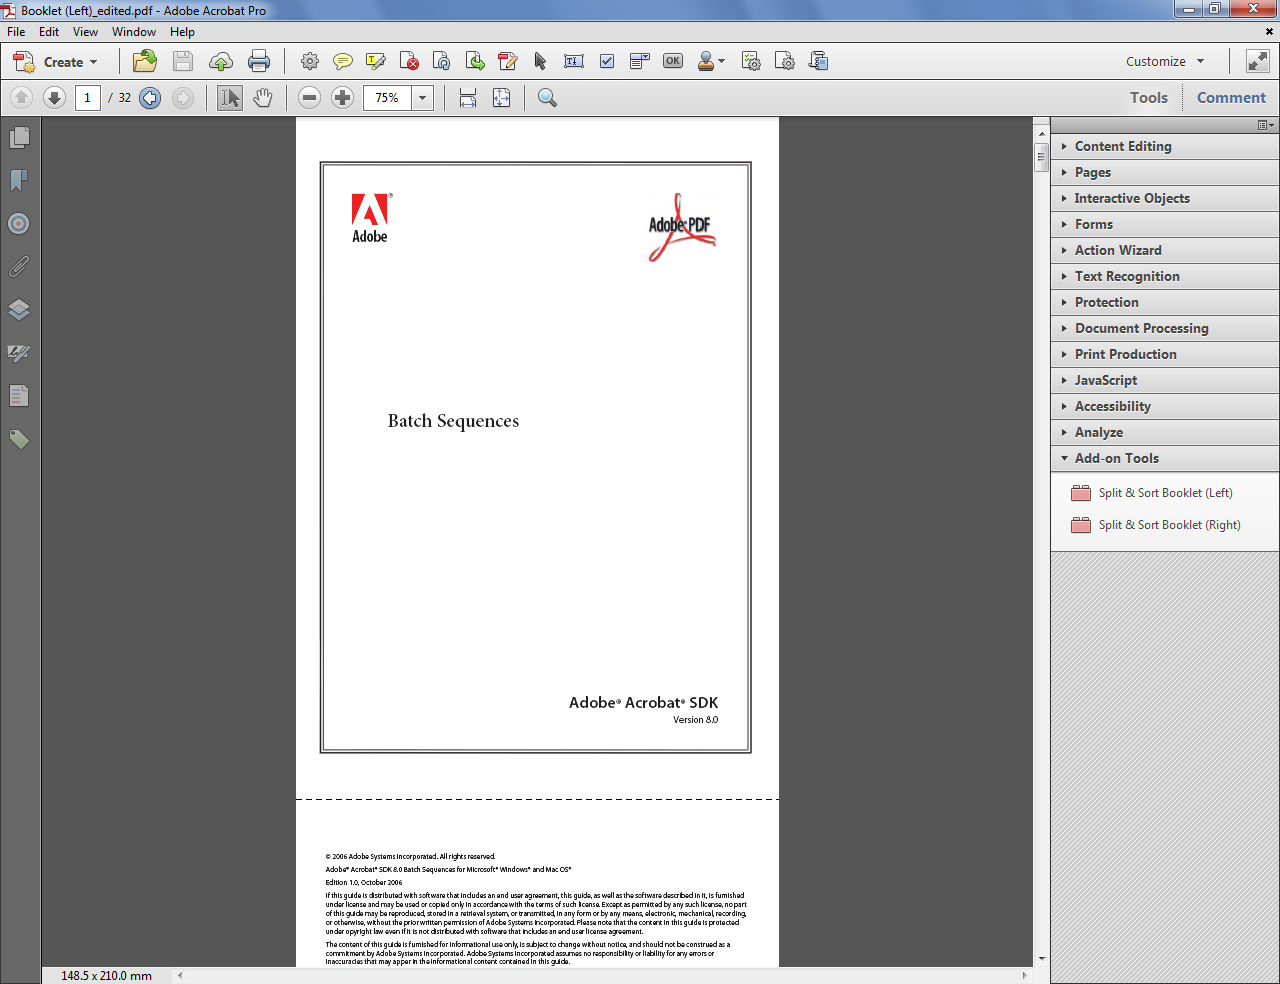 Custom-made Adobe Scripts: 2013